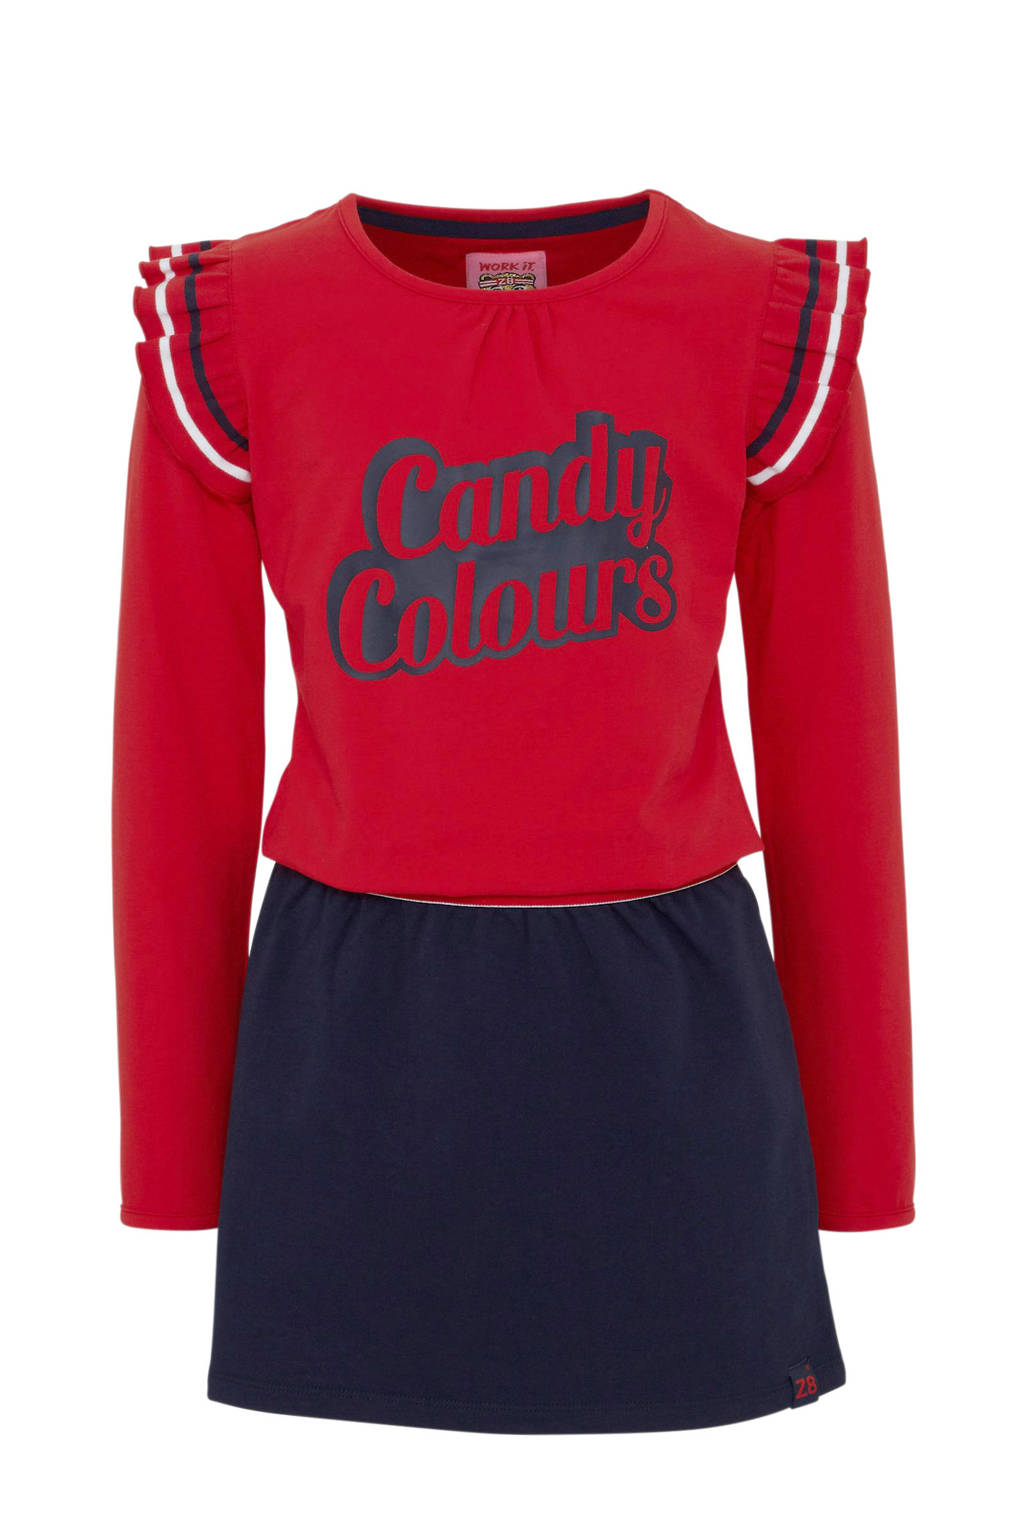 Z8 jersey jurk Ashley met tekst en ruches rood/blauw, Rood/blauw